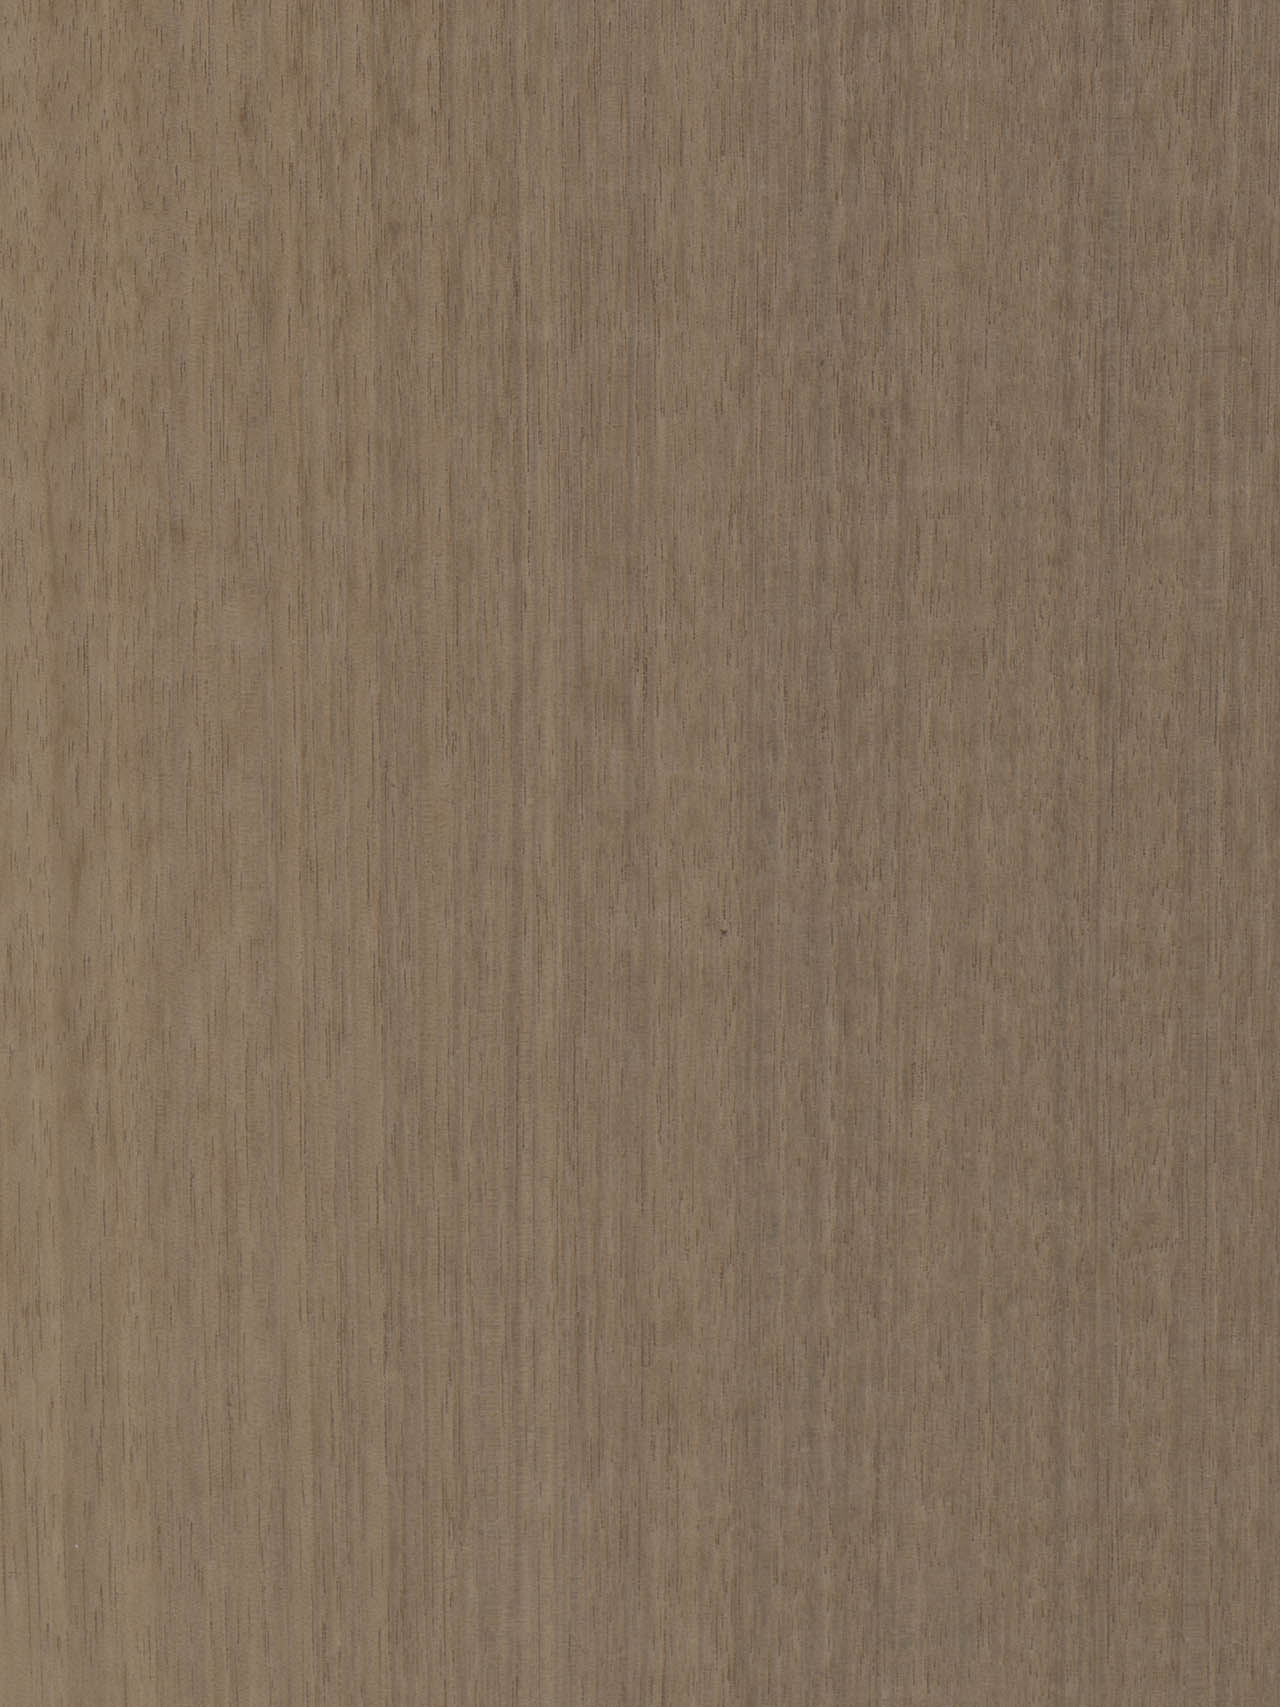 Chapa de Madera Eucalipto Bronce MBF112 Losán